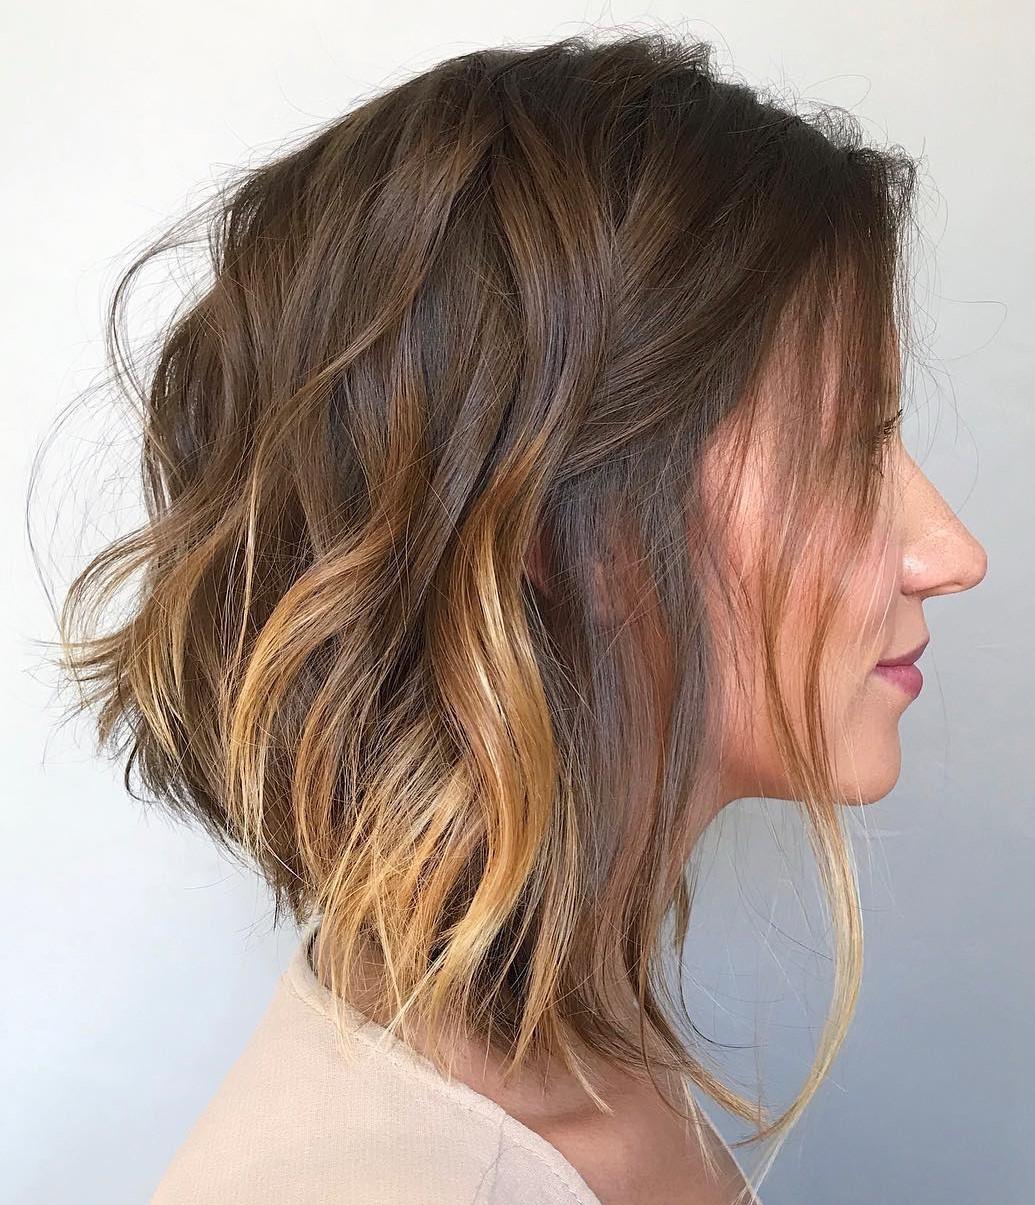 50 Medium Haircuts for Women That'll Be Huge in 2020 - Hair Adviser